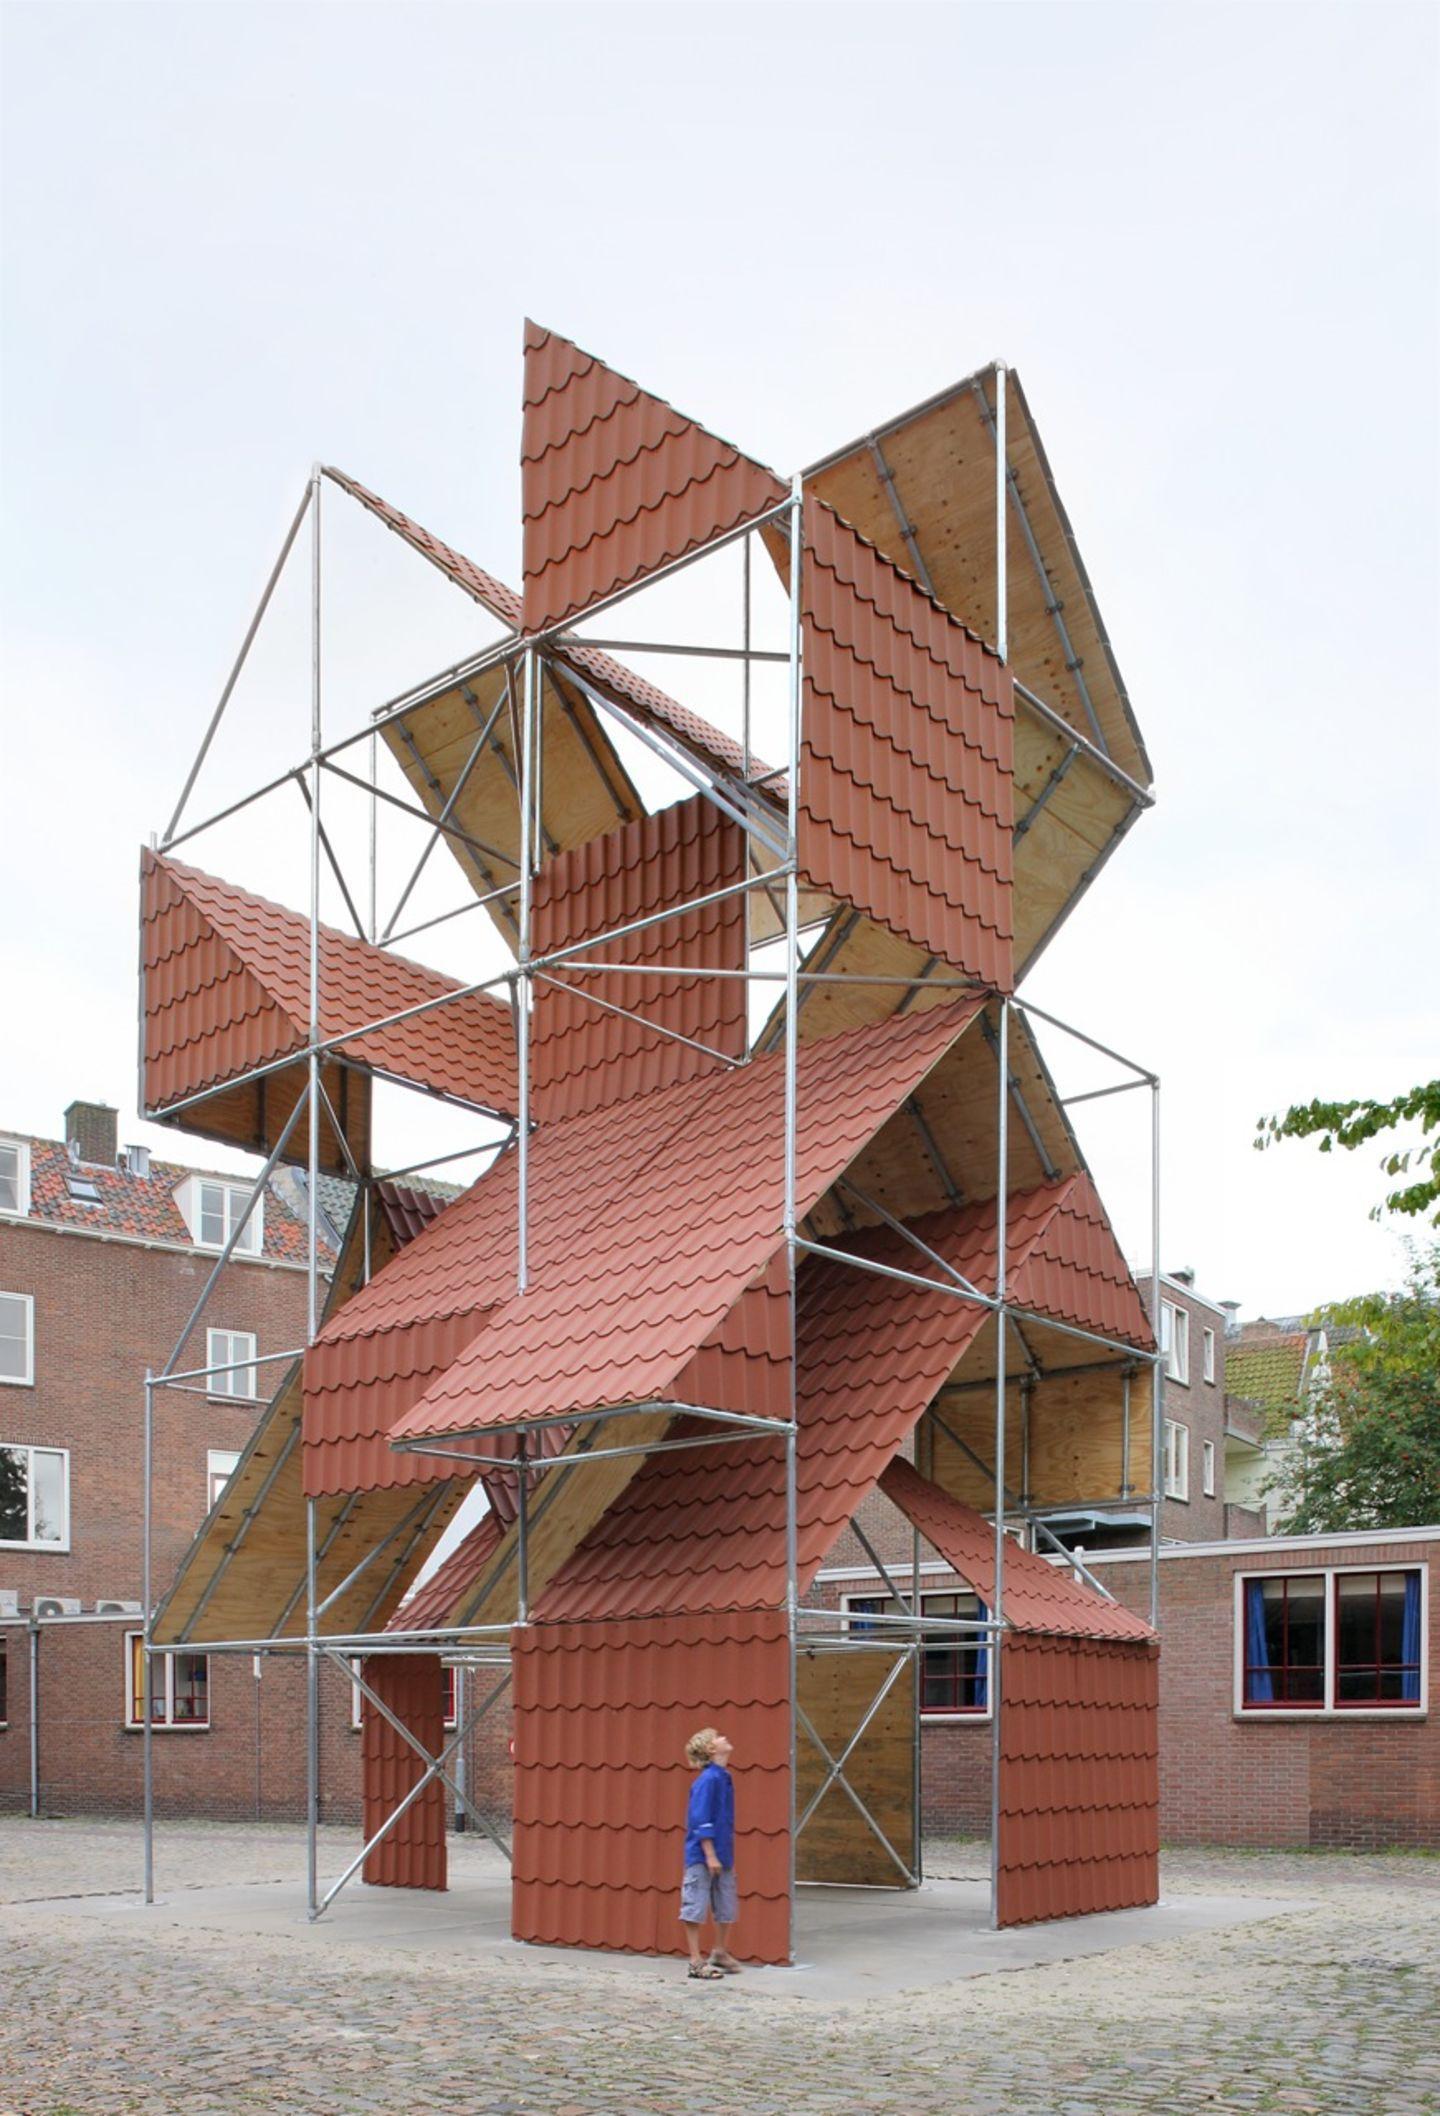 Filip dujardin 2x3x5 middelburg divisare - Dekonstruktivismus architektur ...